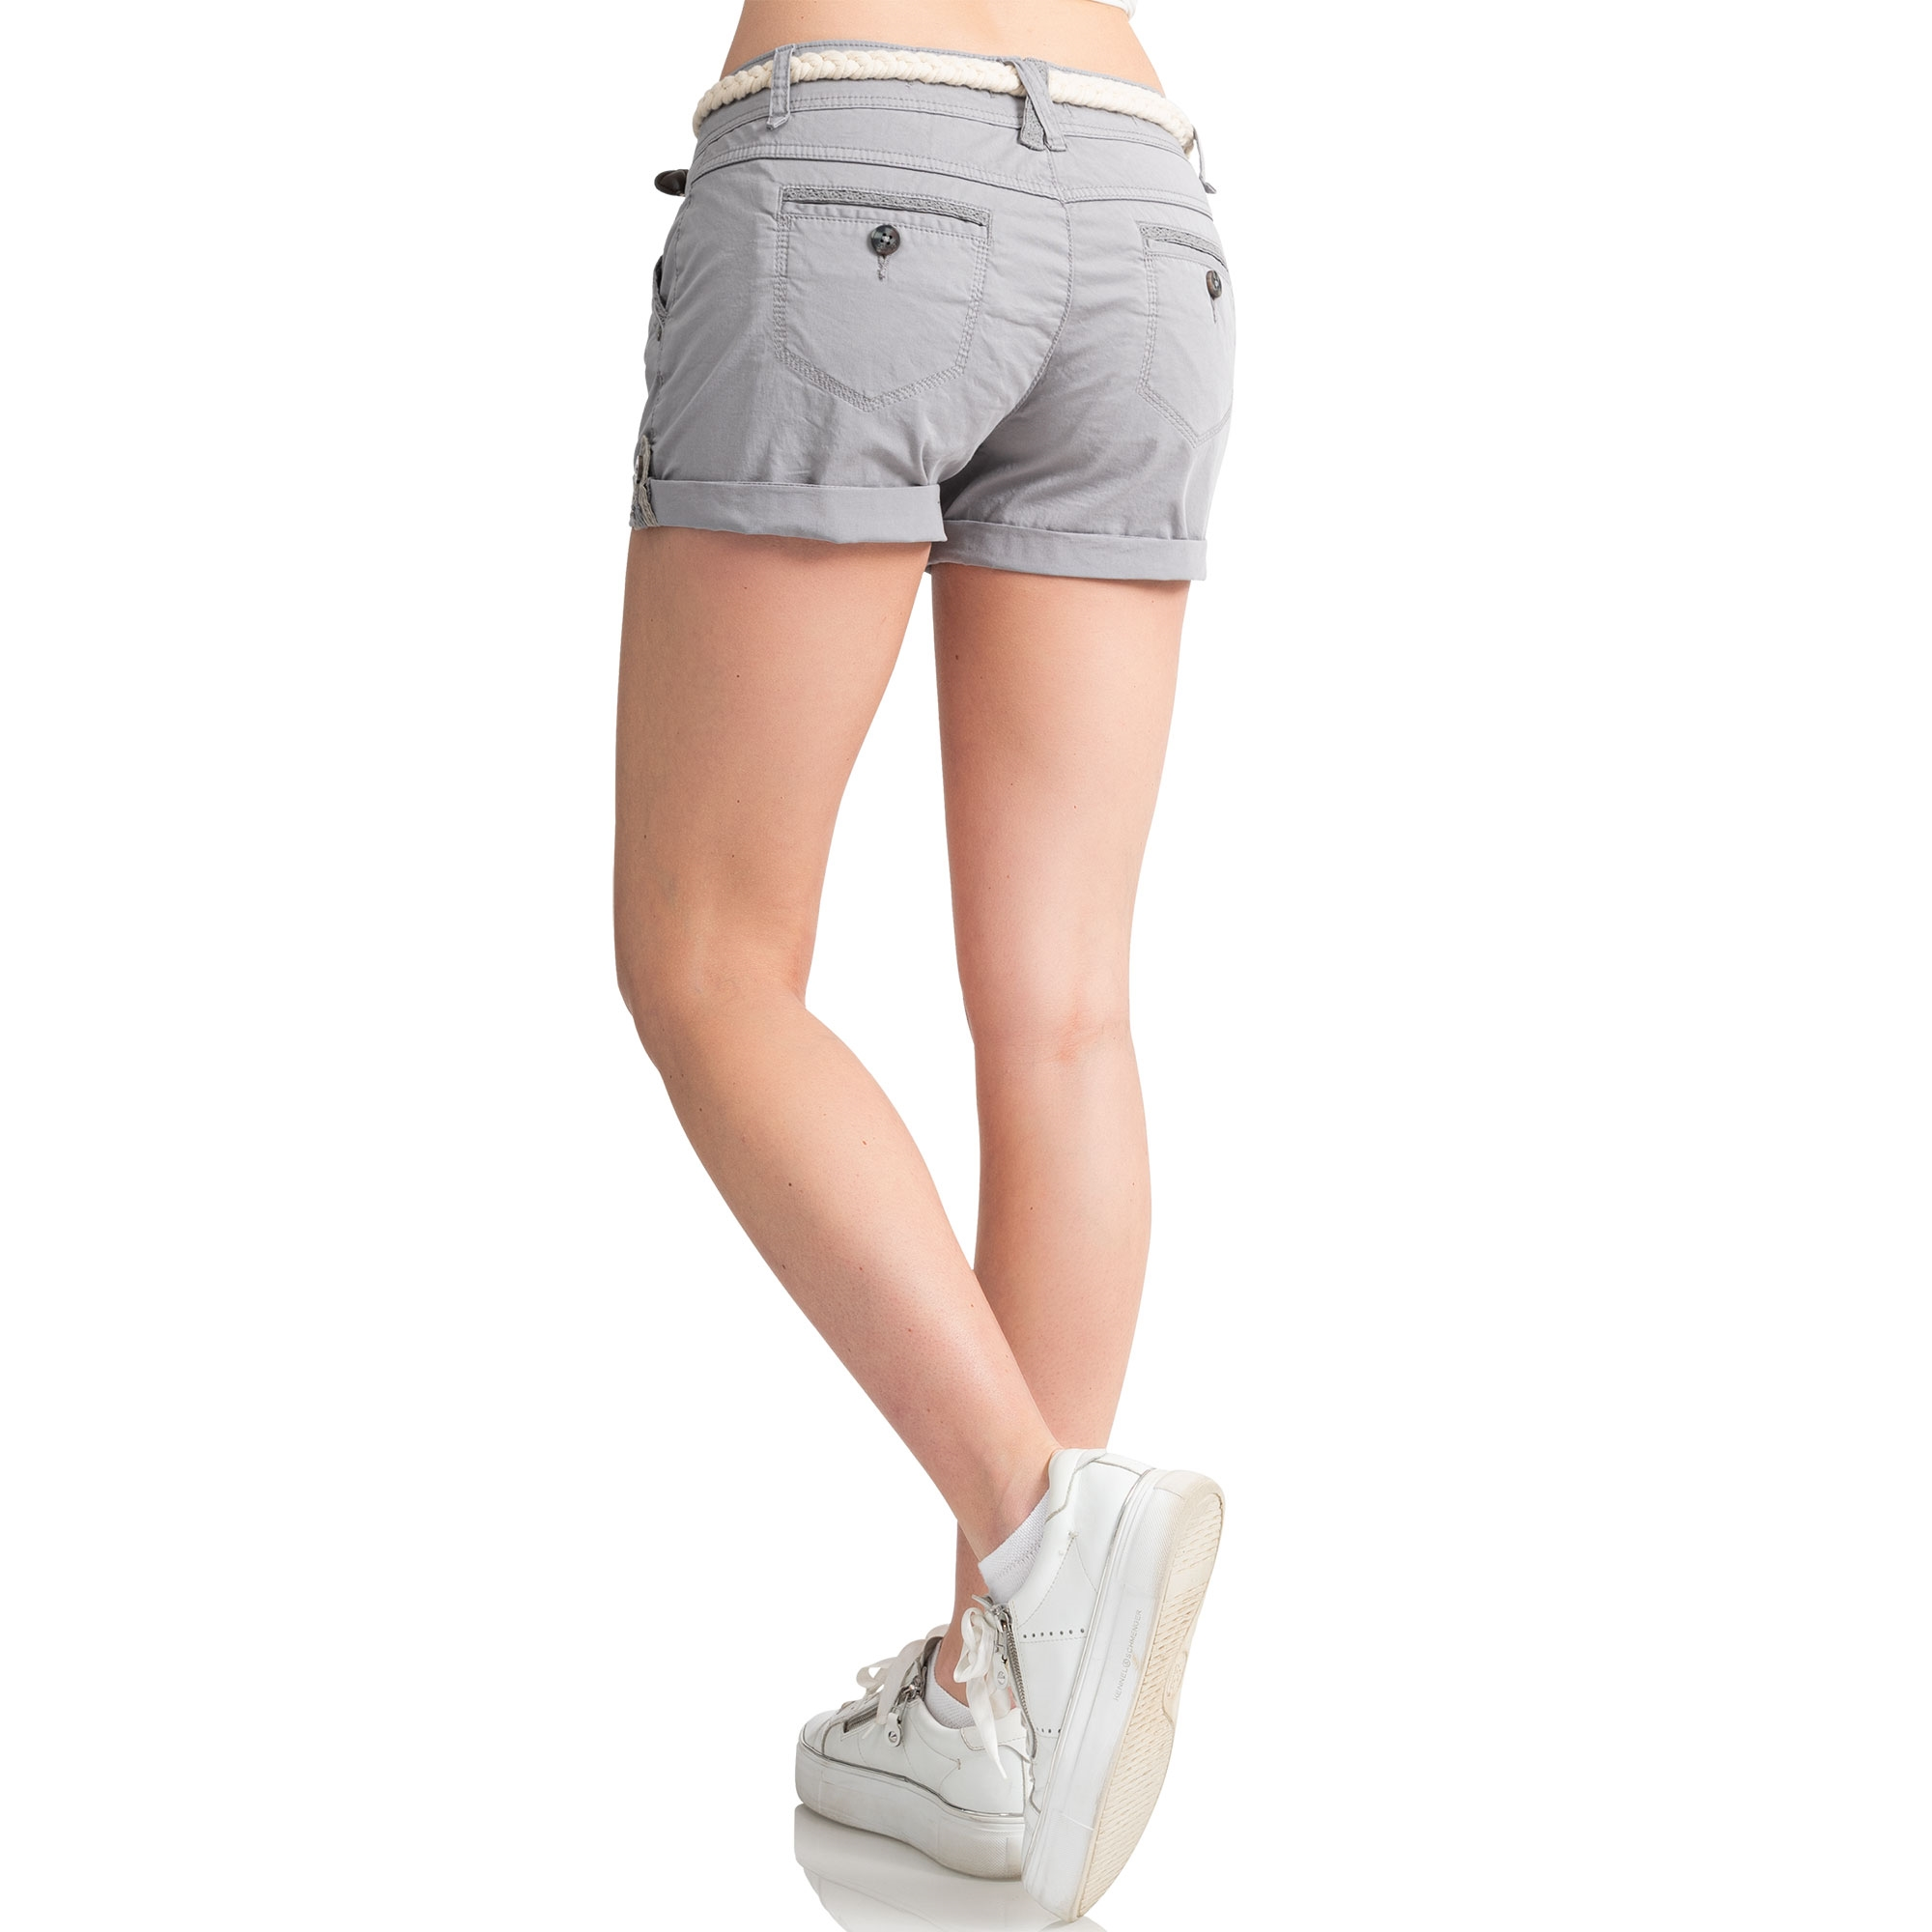 Indexbild 13 - Eight2Nine Damen Chino Bermuda Stretch Shorts mit Flecht Gürtel Hotpants